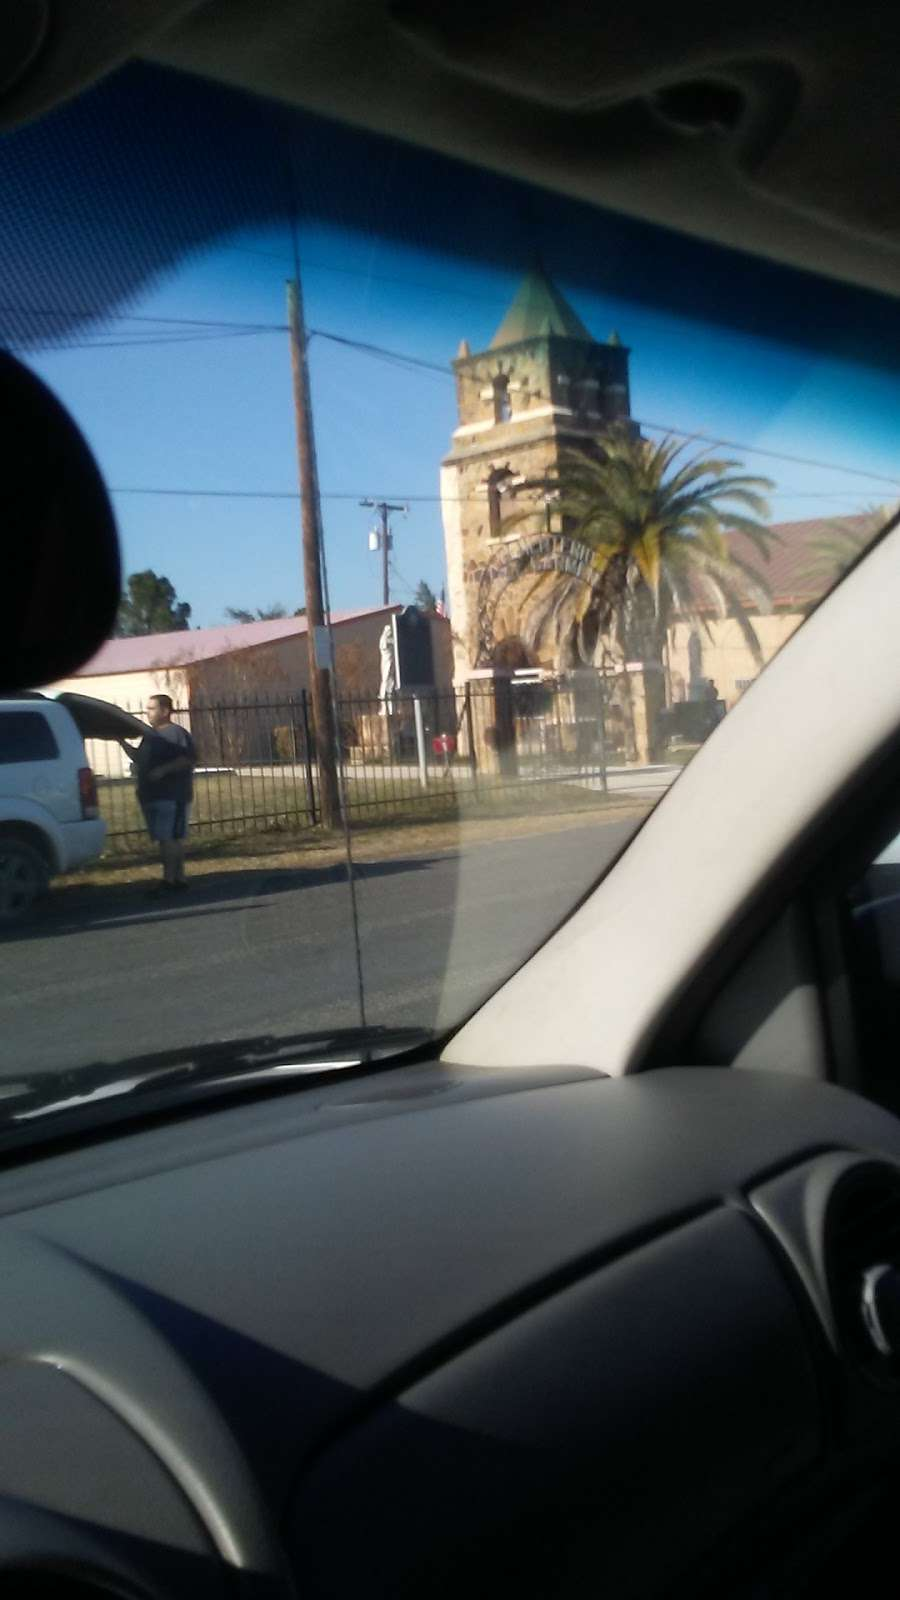 El Carmen Church - church  | Photo 8 of 9 | Address: 18555 Leal Rd, San Antonio, TX 78221, USA | Phone: (210) 626-2333